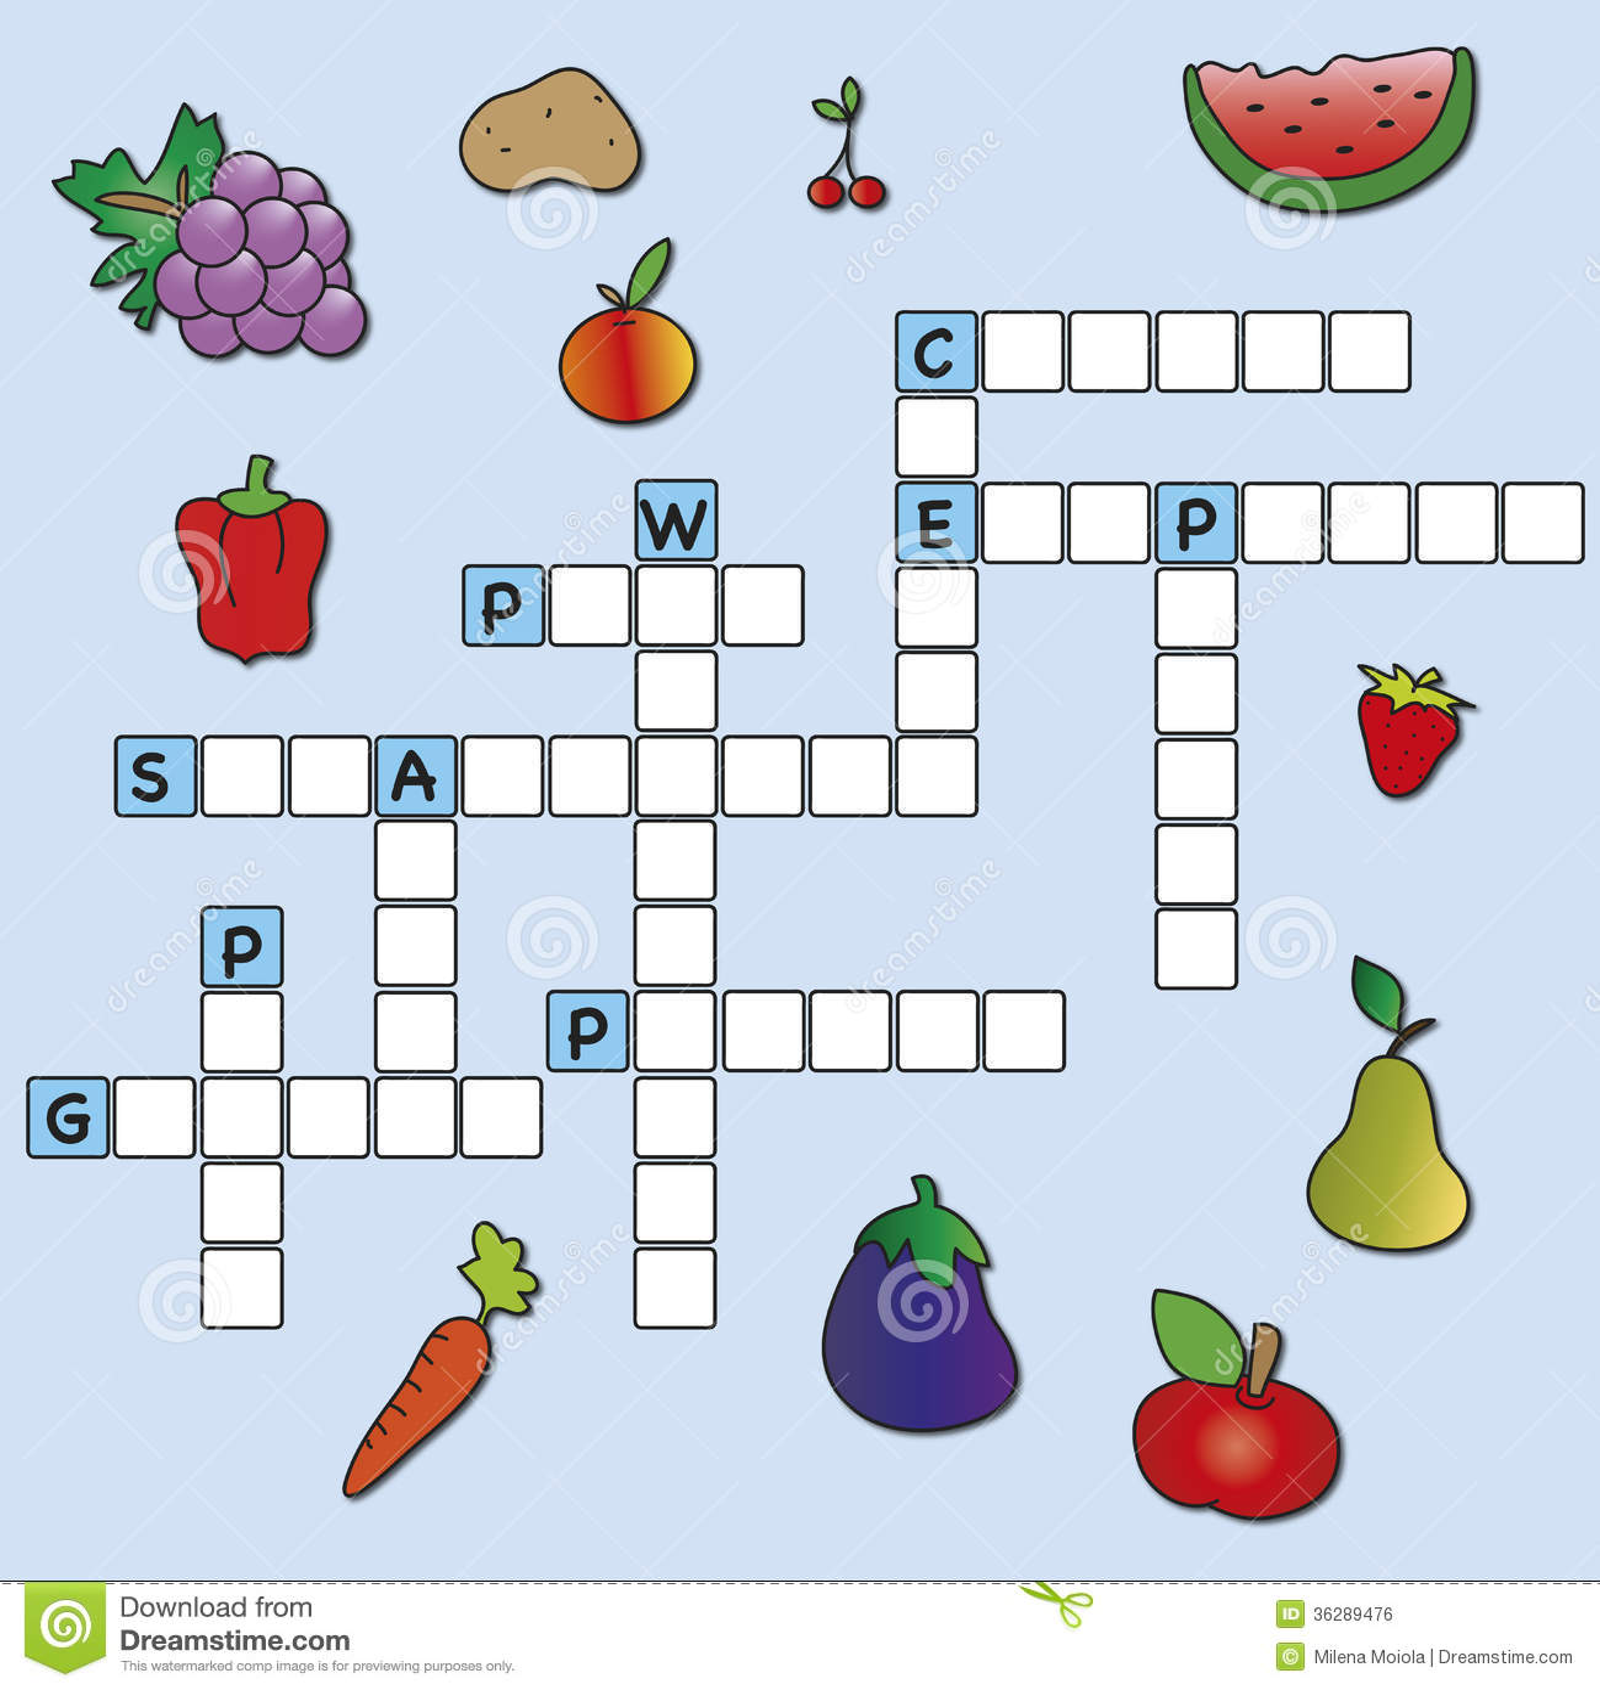 Heavy And Light Worksheets For Kindergarten Together With Worksheet ...